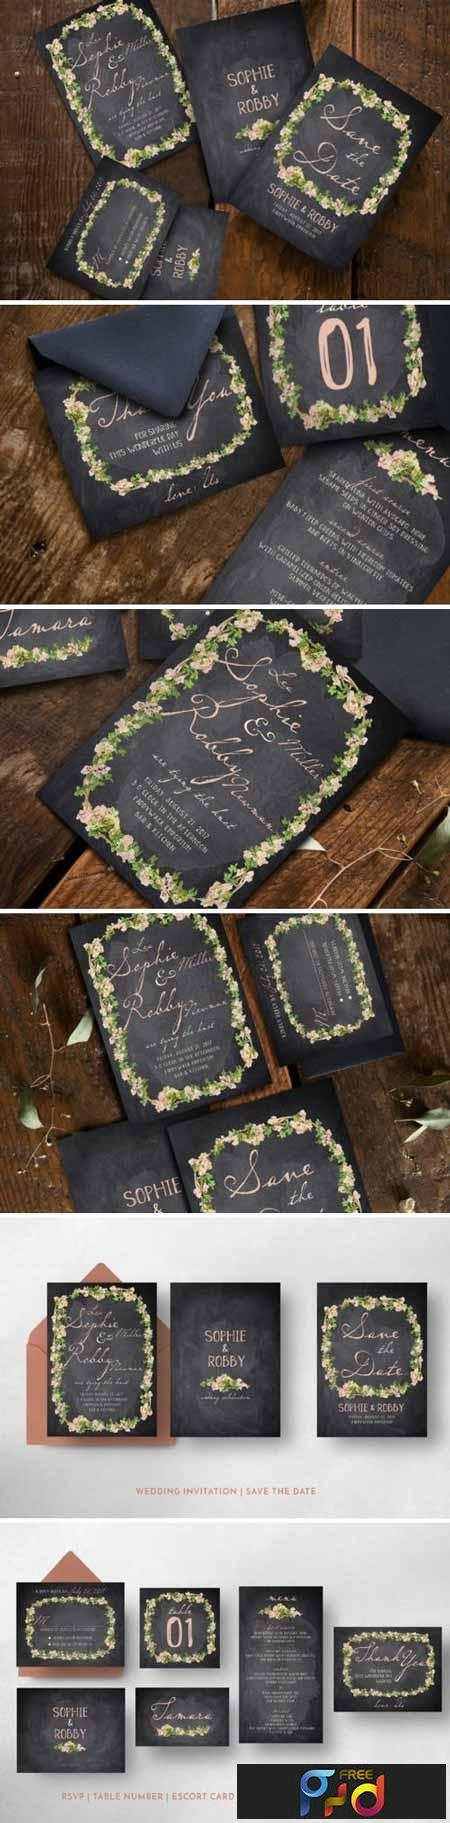 Vintage Flower Wedding Suite 847414 1